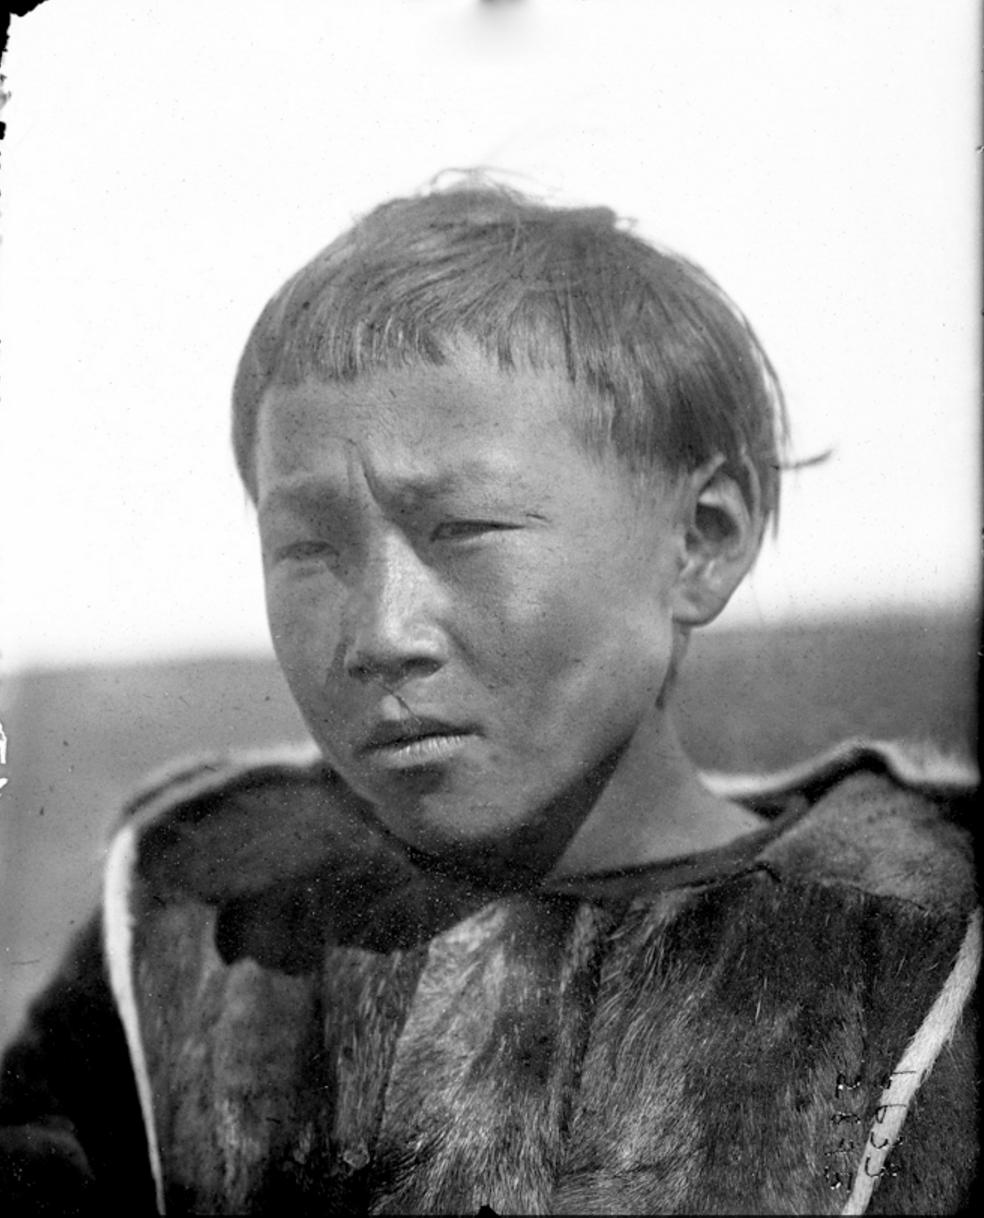 Приморский подросток коряк, Россия, 1901